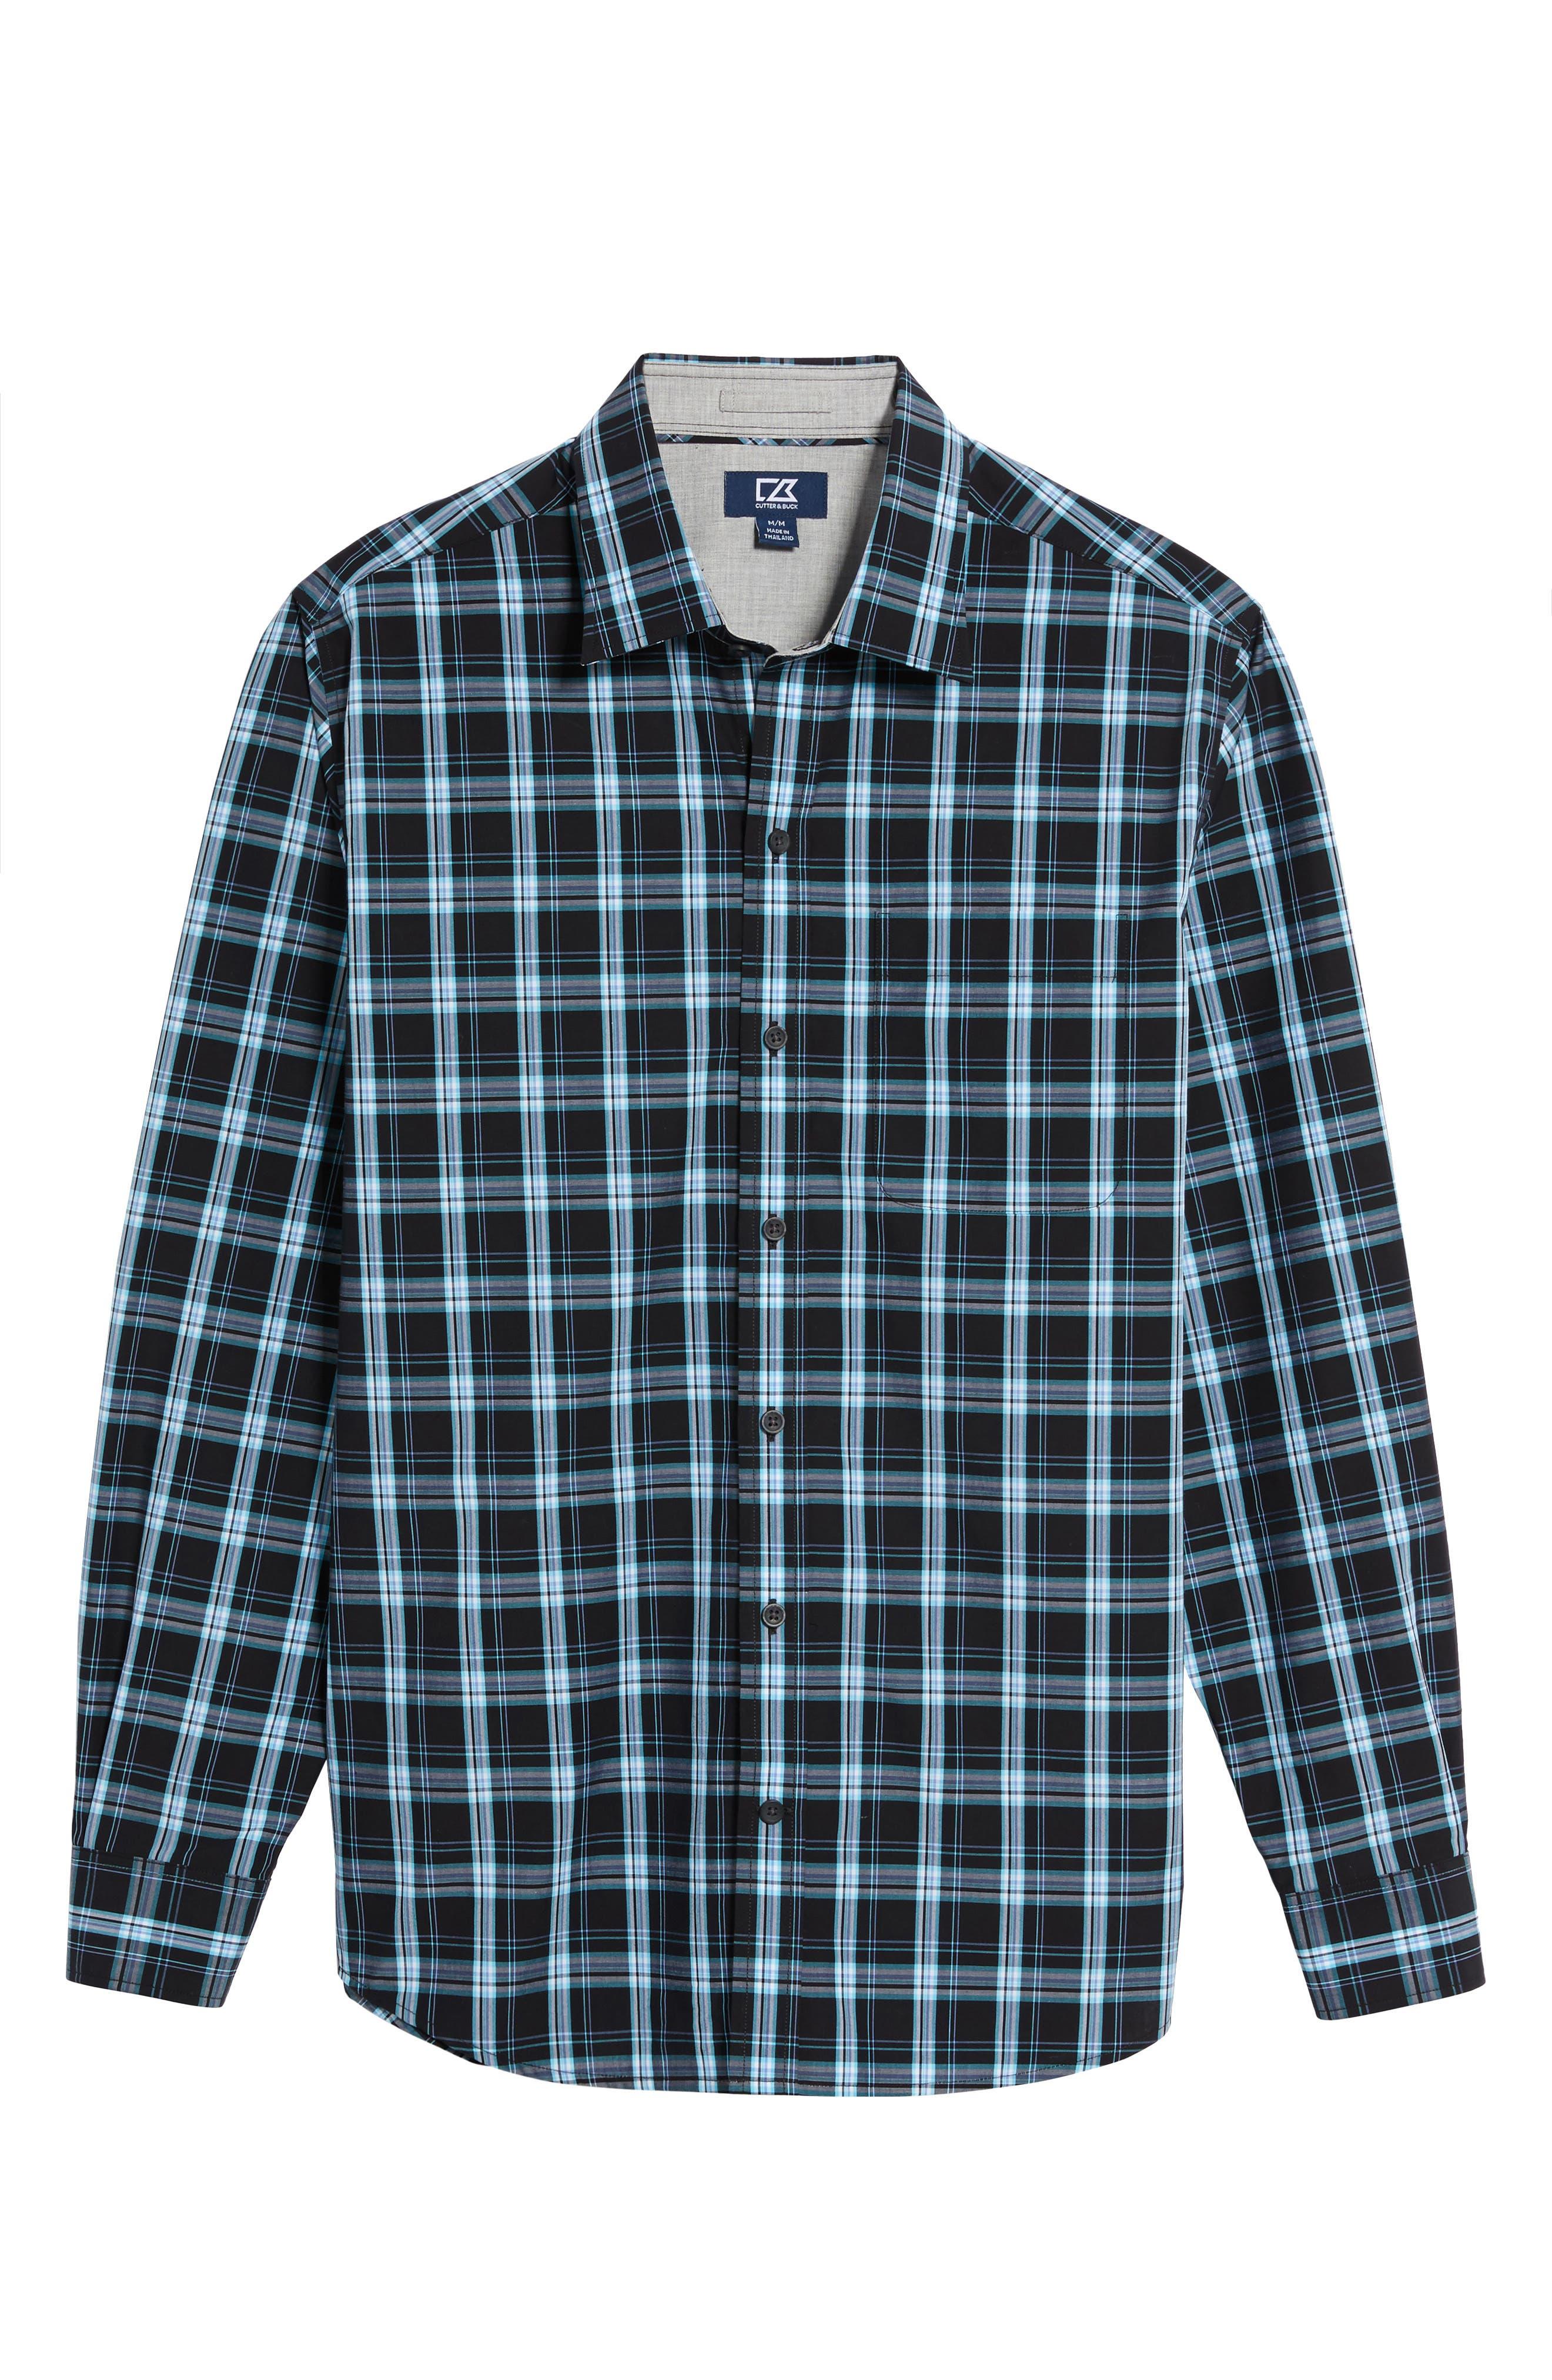 Summerland Non-Iron Plaid Sport Shirt,                             Alternate thumbnail 6, color,                             Wisteria